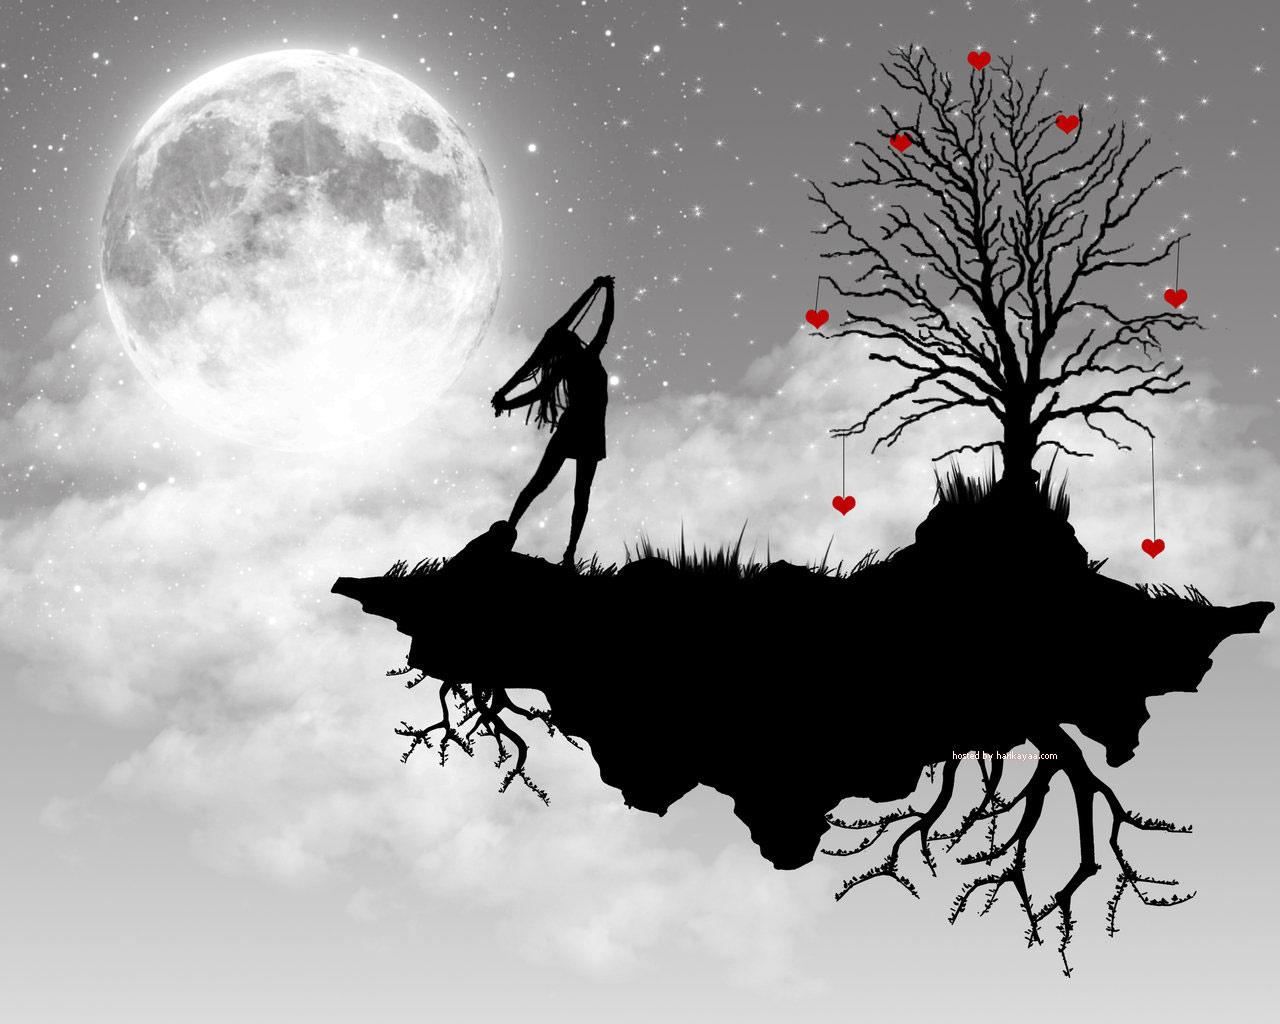 gothic_dream_by_bonniebones-d32qjss